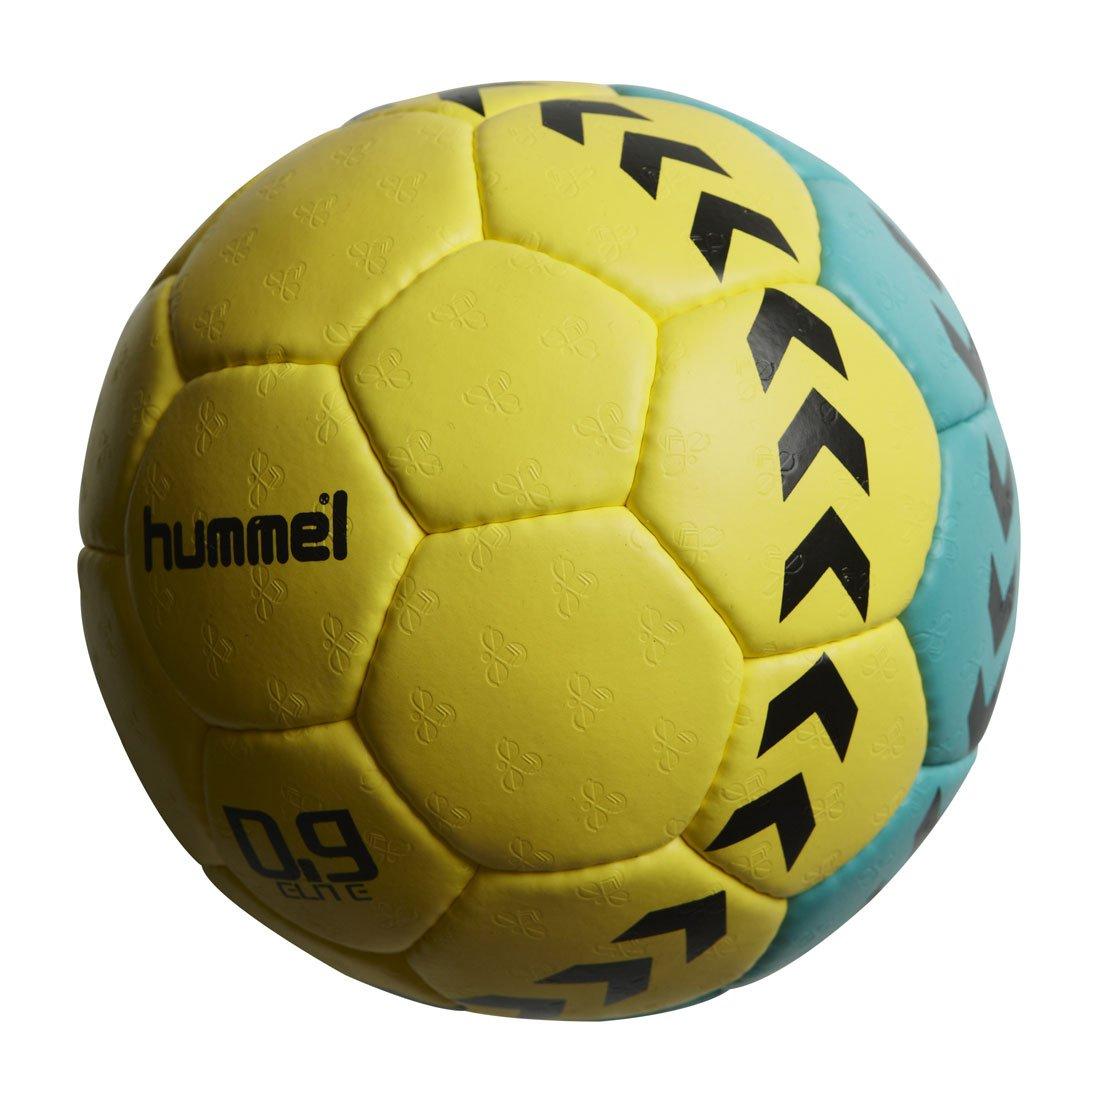 hummel 0 9 Elite - Pelota, tamaño 2, Multicolor: Amazon.es ...